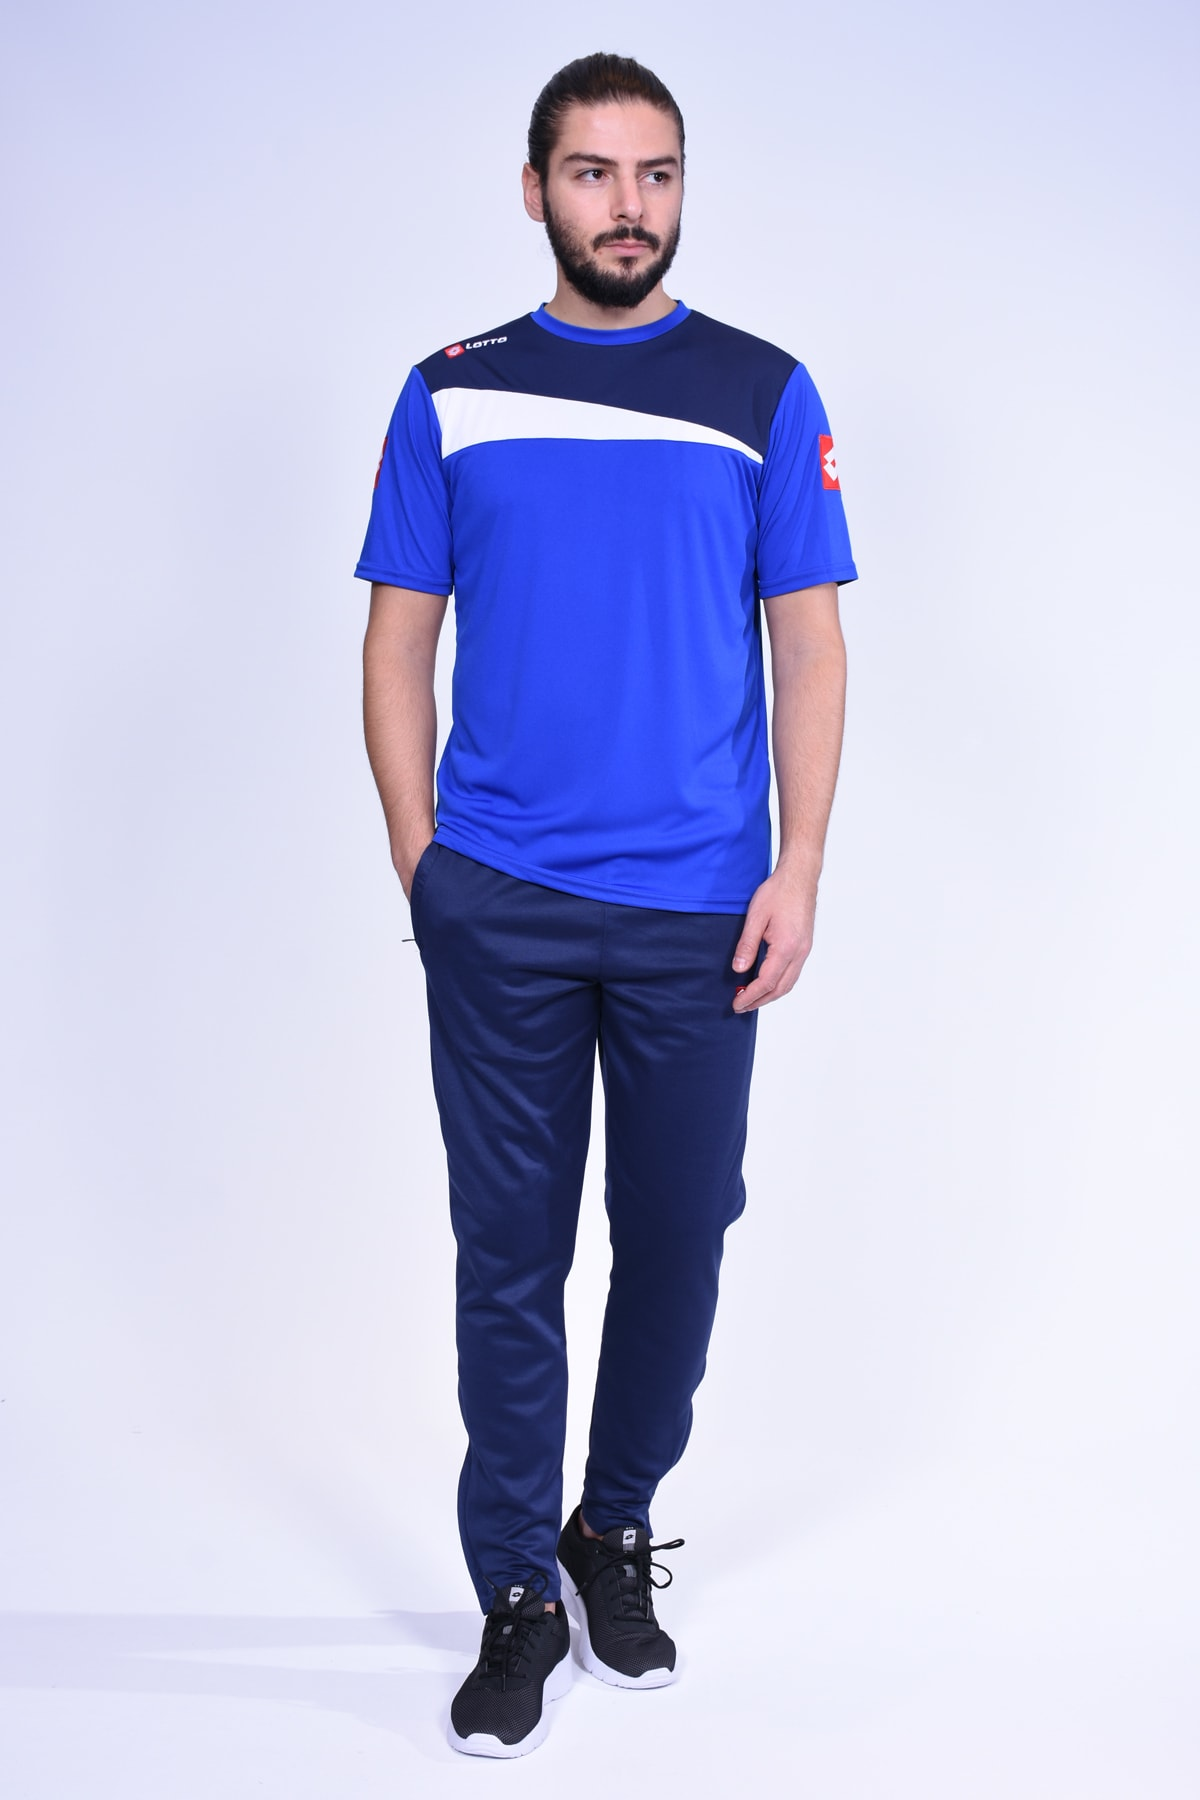 - T-shirt - Truro Tee Antr Pl - R7116 - Saks-lacivert